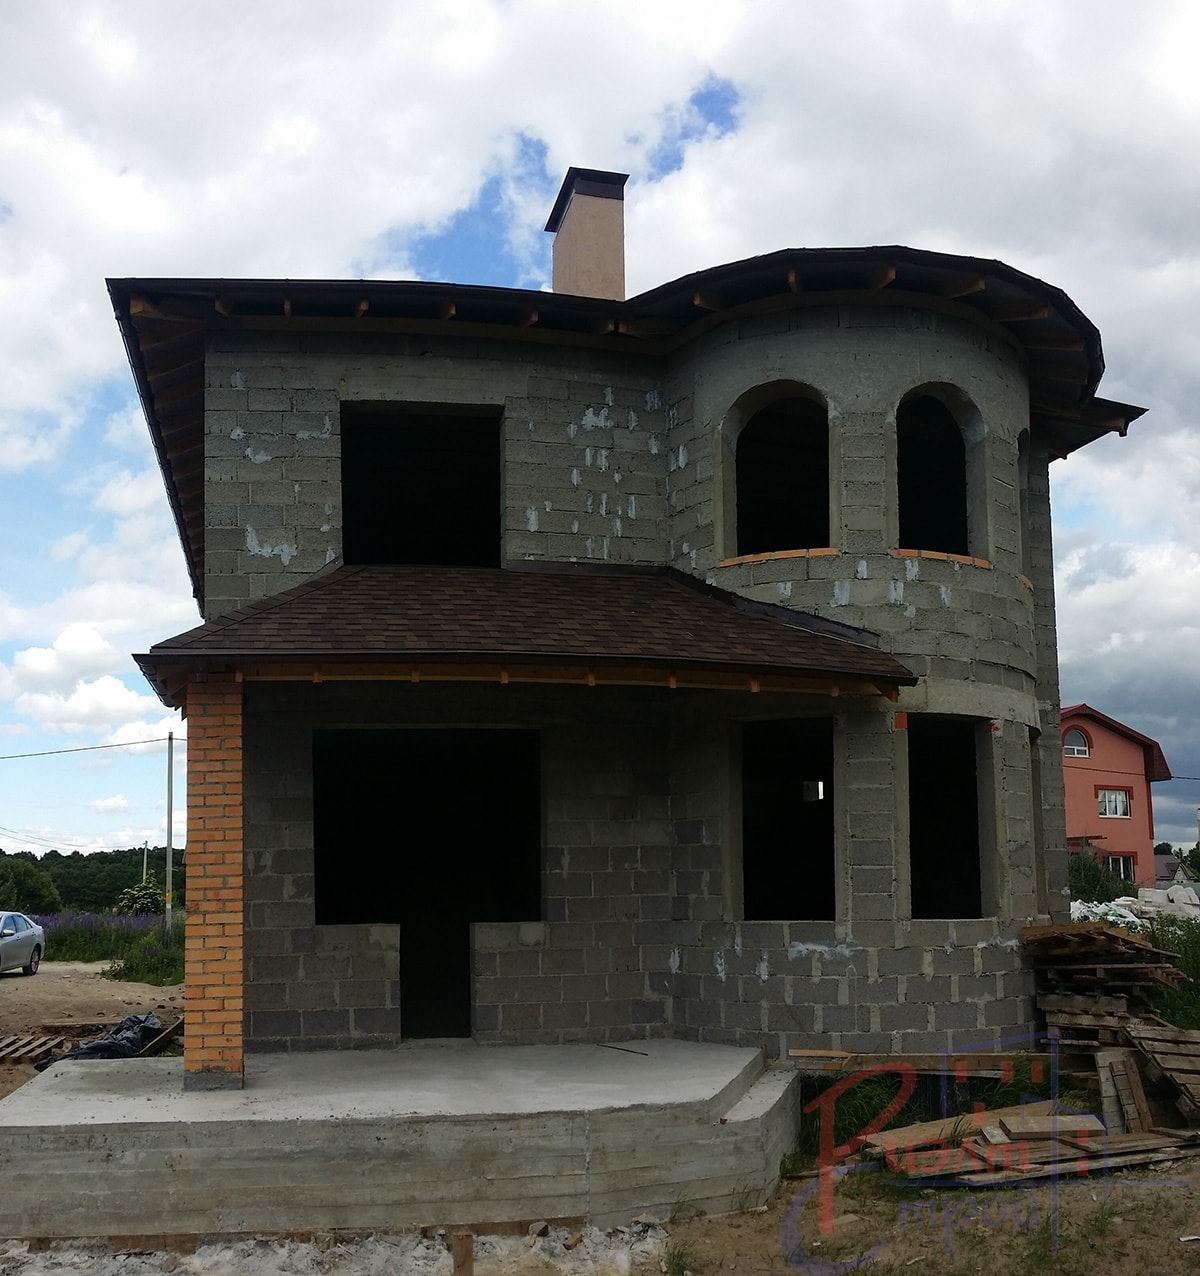 Дом 190м2 — 2015 год постройки, фото 4